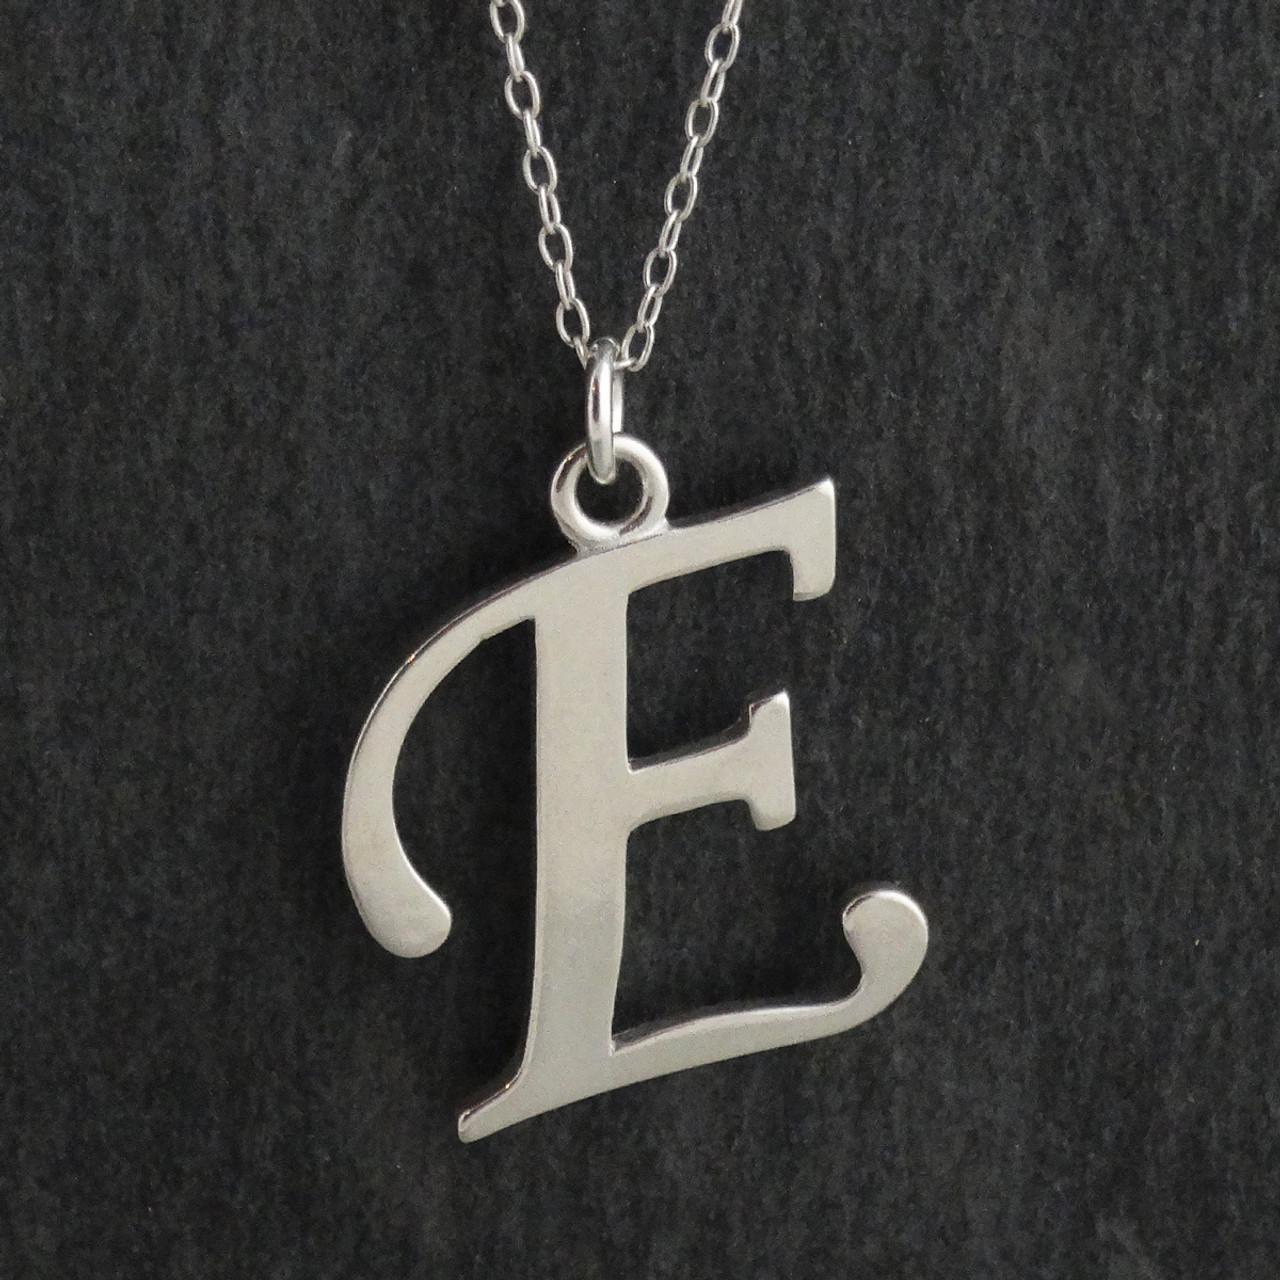 925 Sterling Silver E Charm